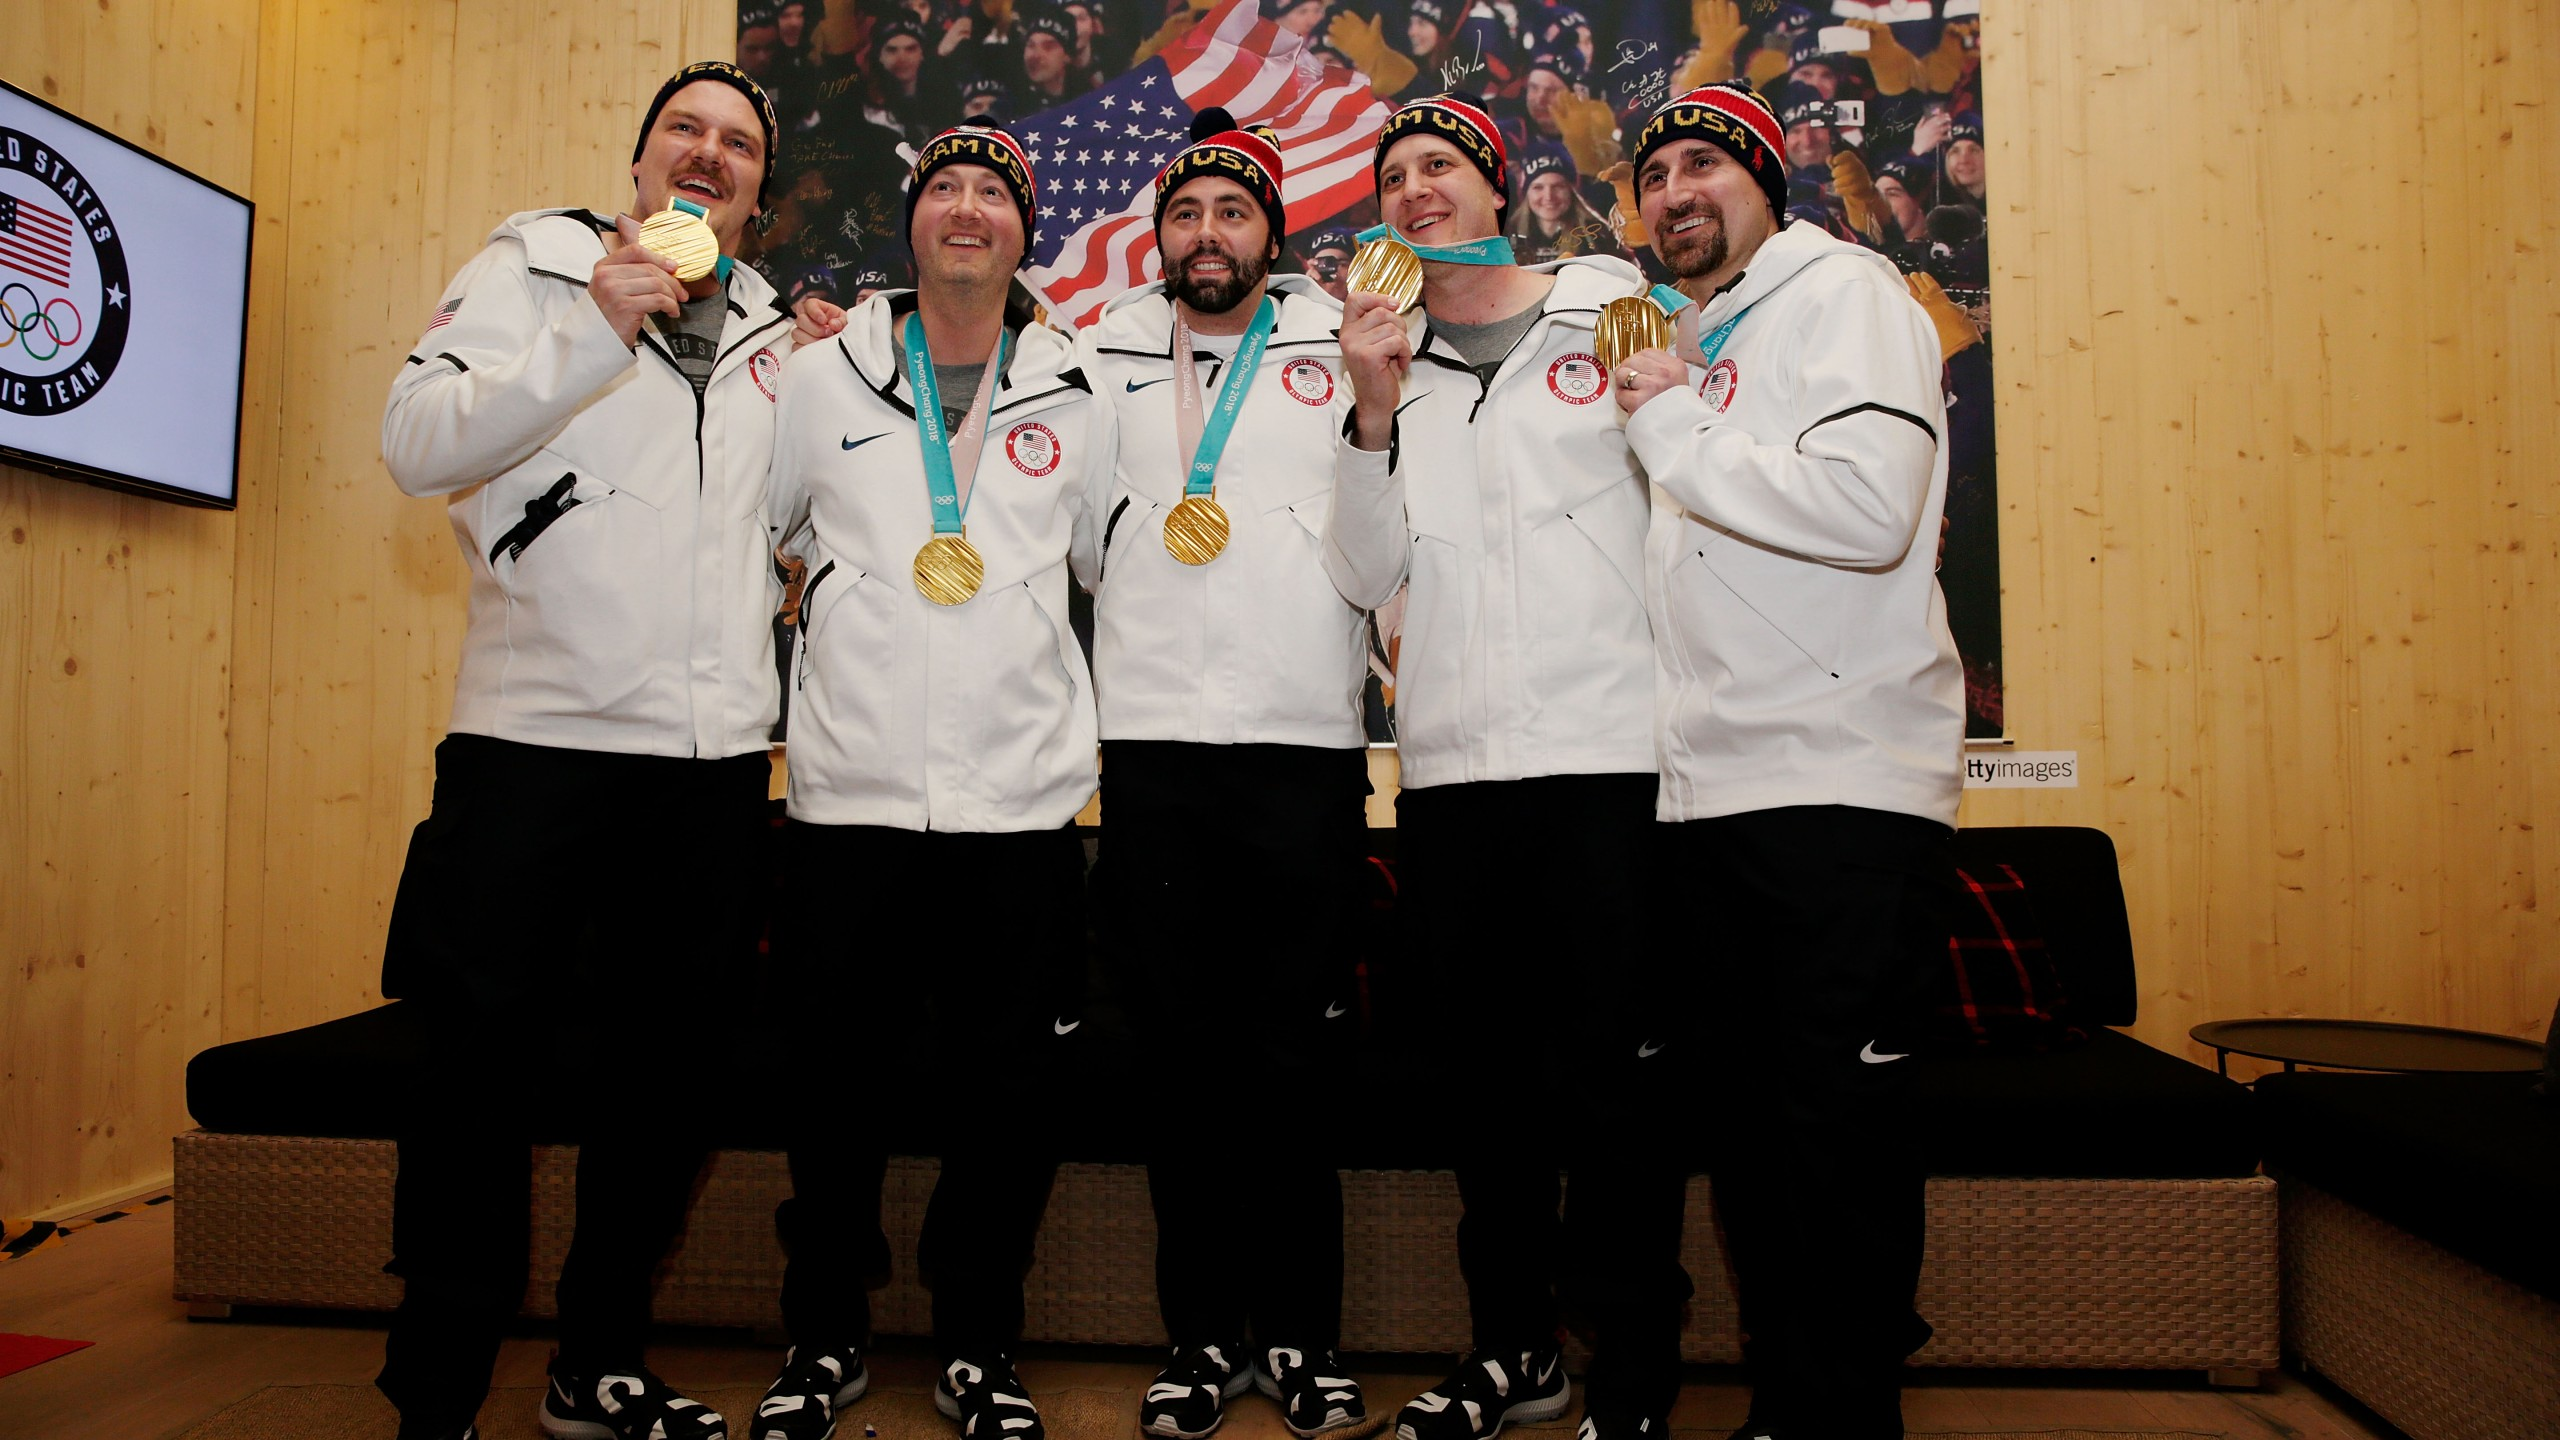 USA House at the PyeongChang 2018 Winter Olympic Games_527461